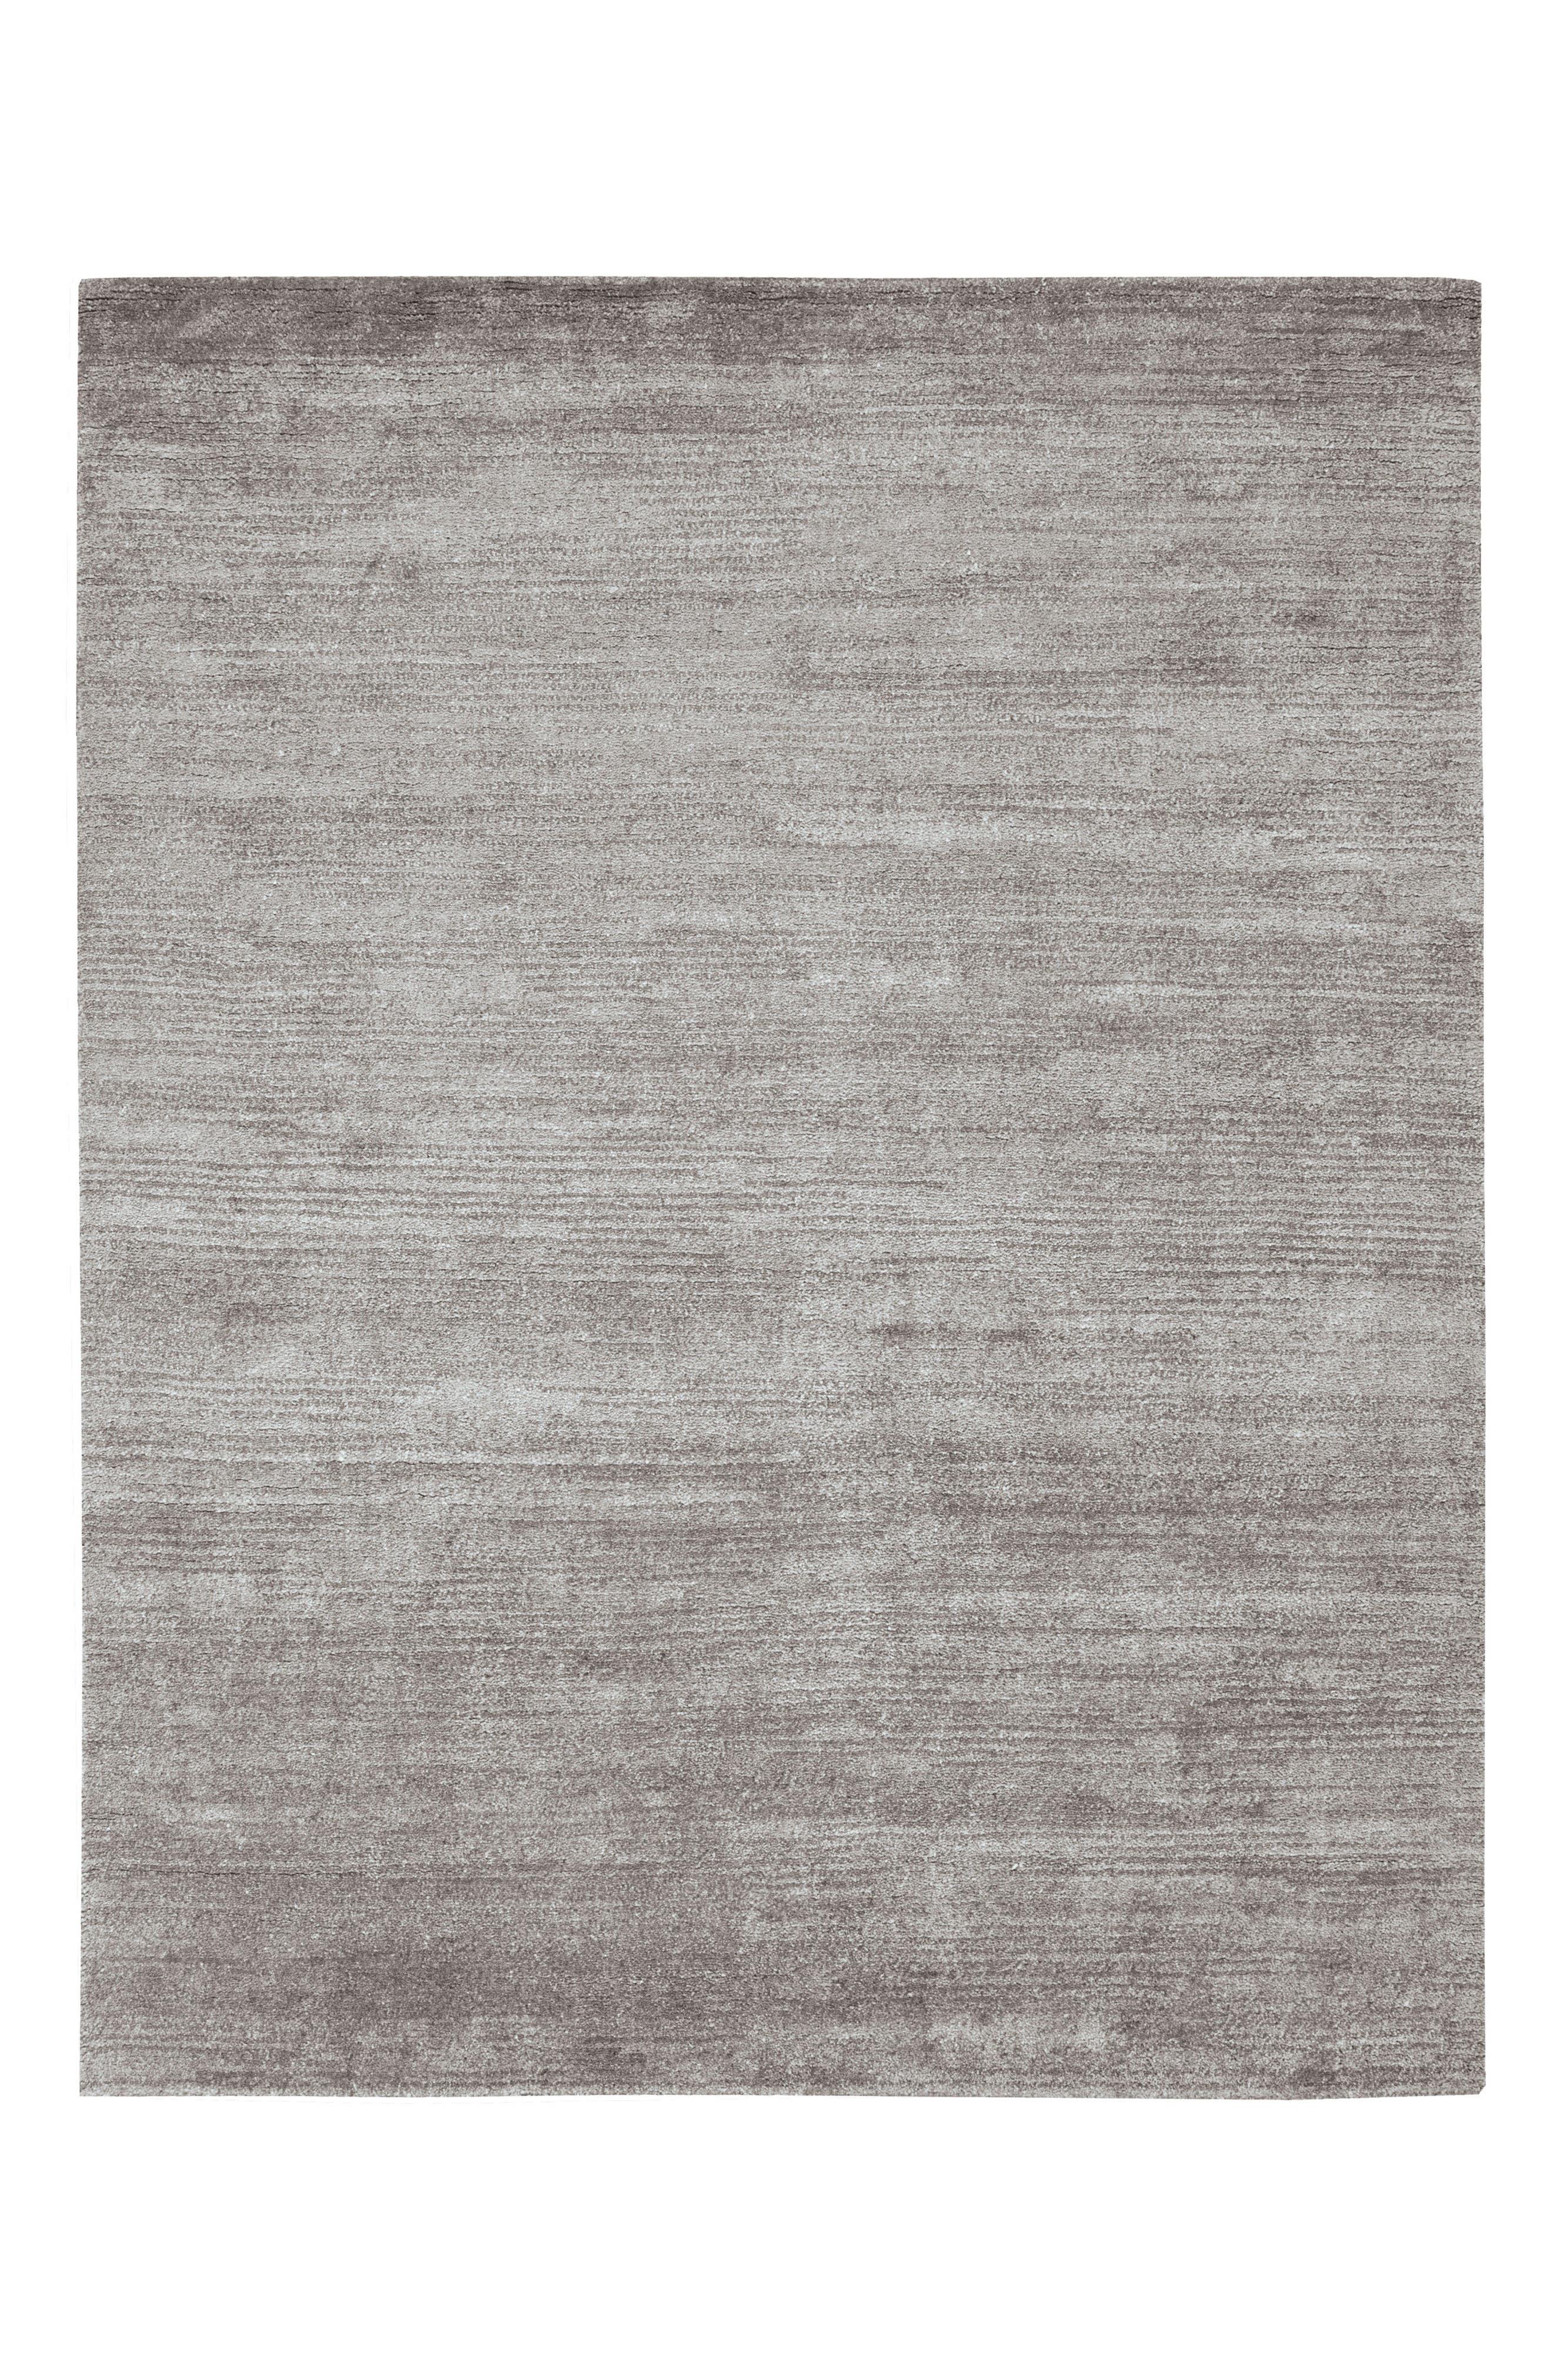 Alternate Image 1 Selected - Calvin Klein Varick Area Rug